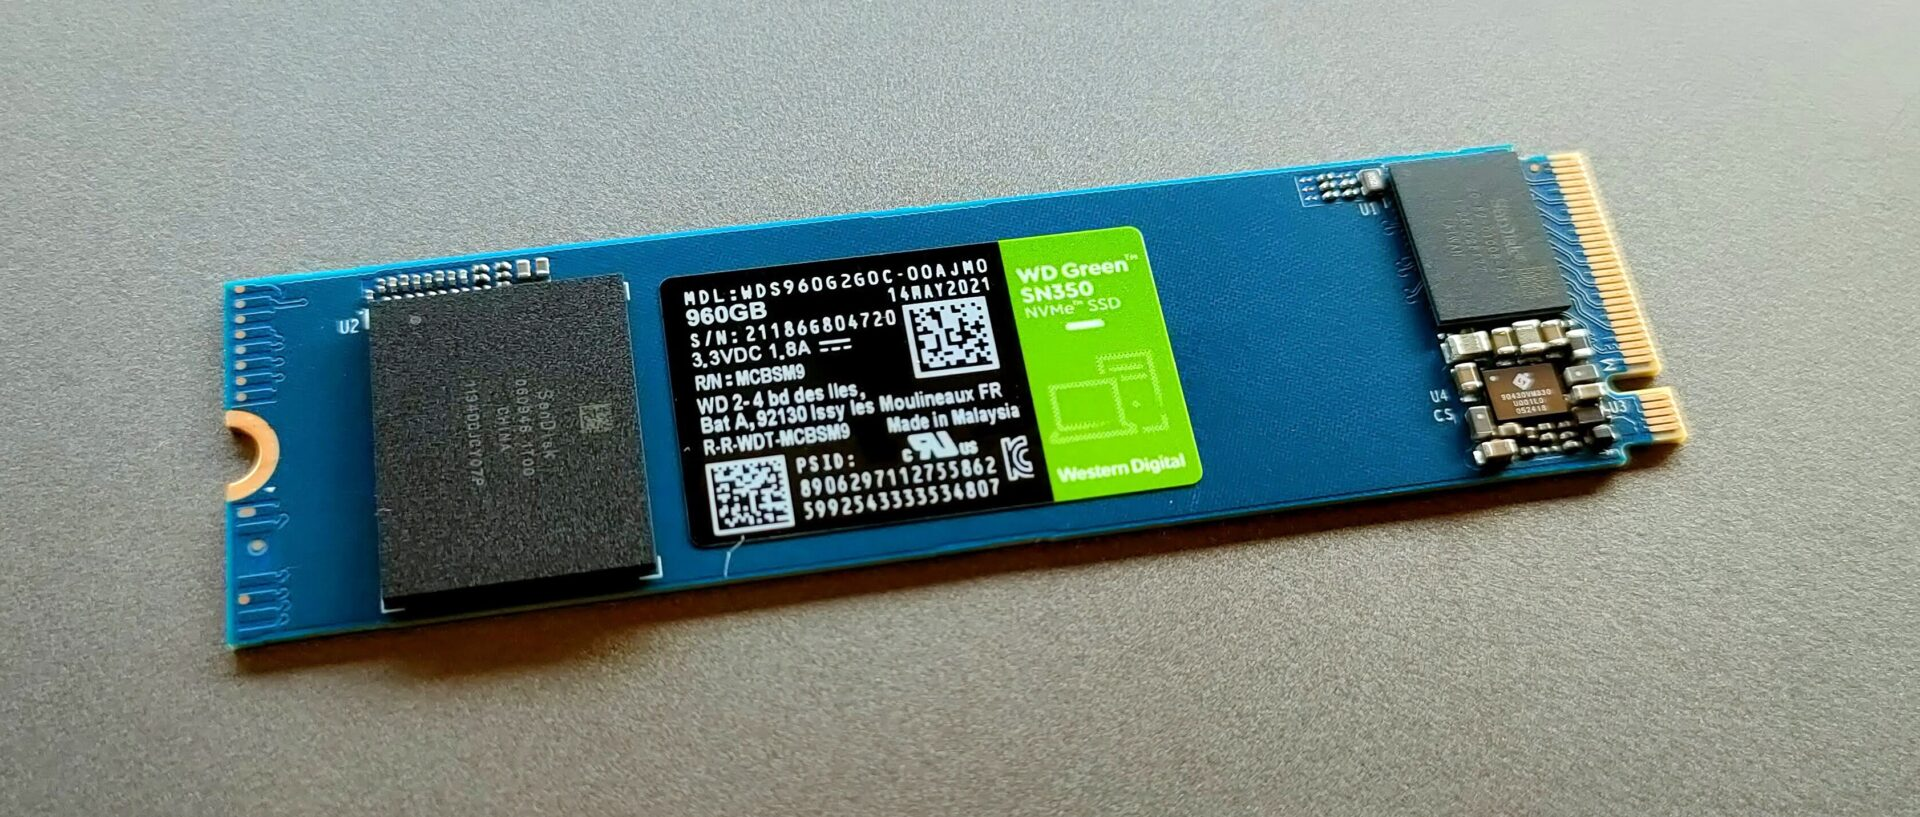 Western DigitalのWDS960G2G0Cは片面実装 (表側)